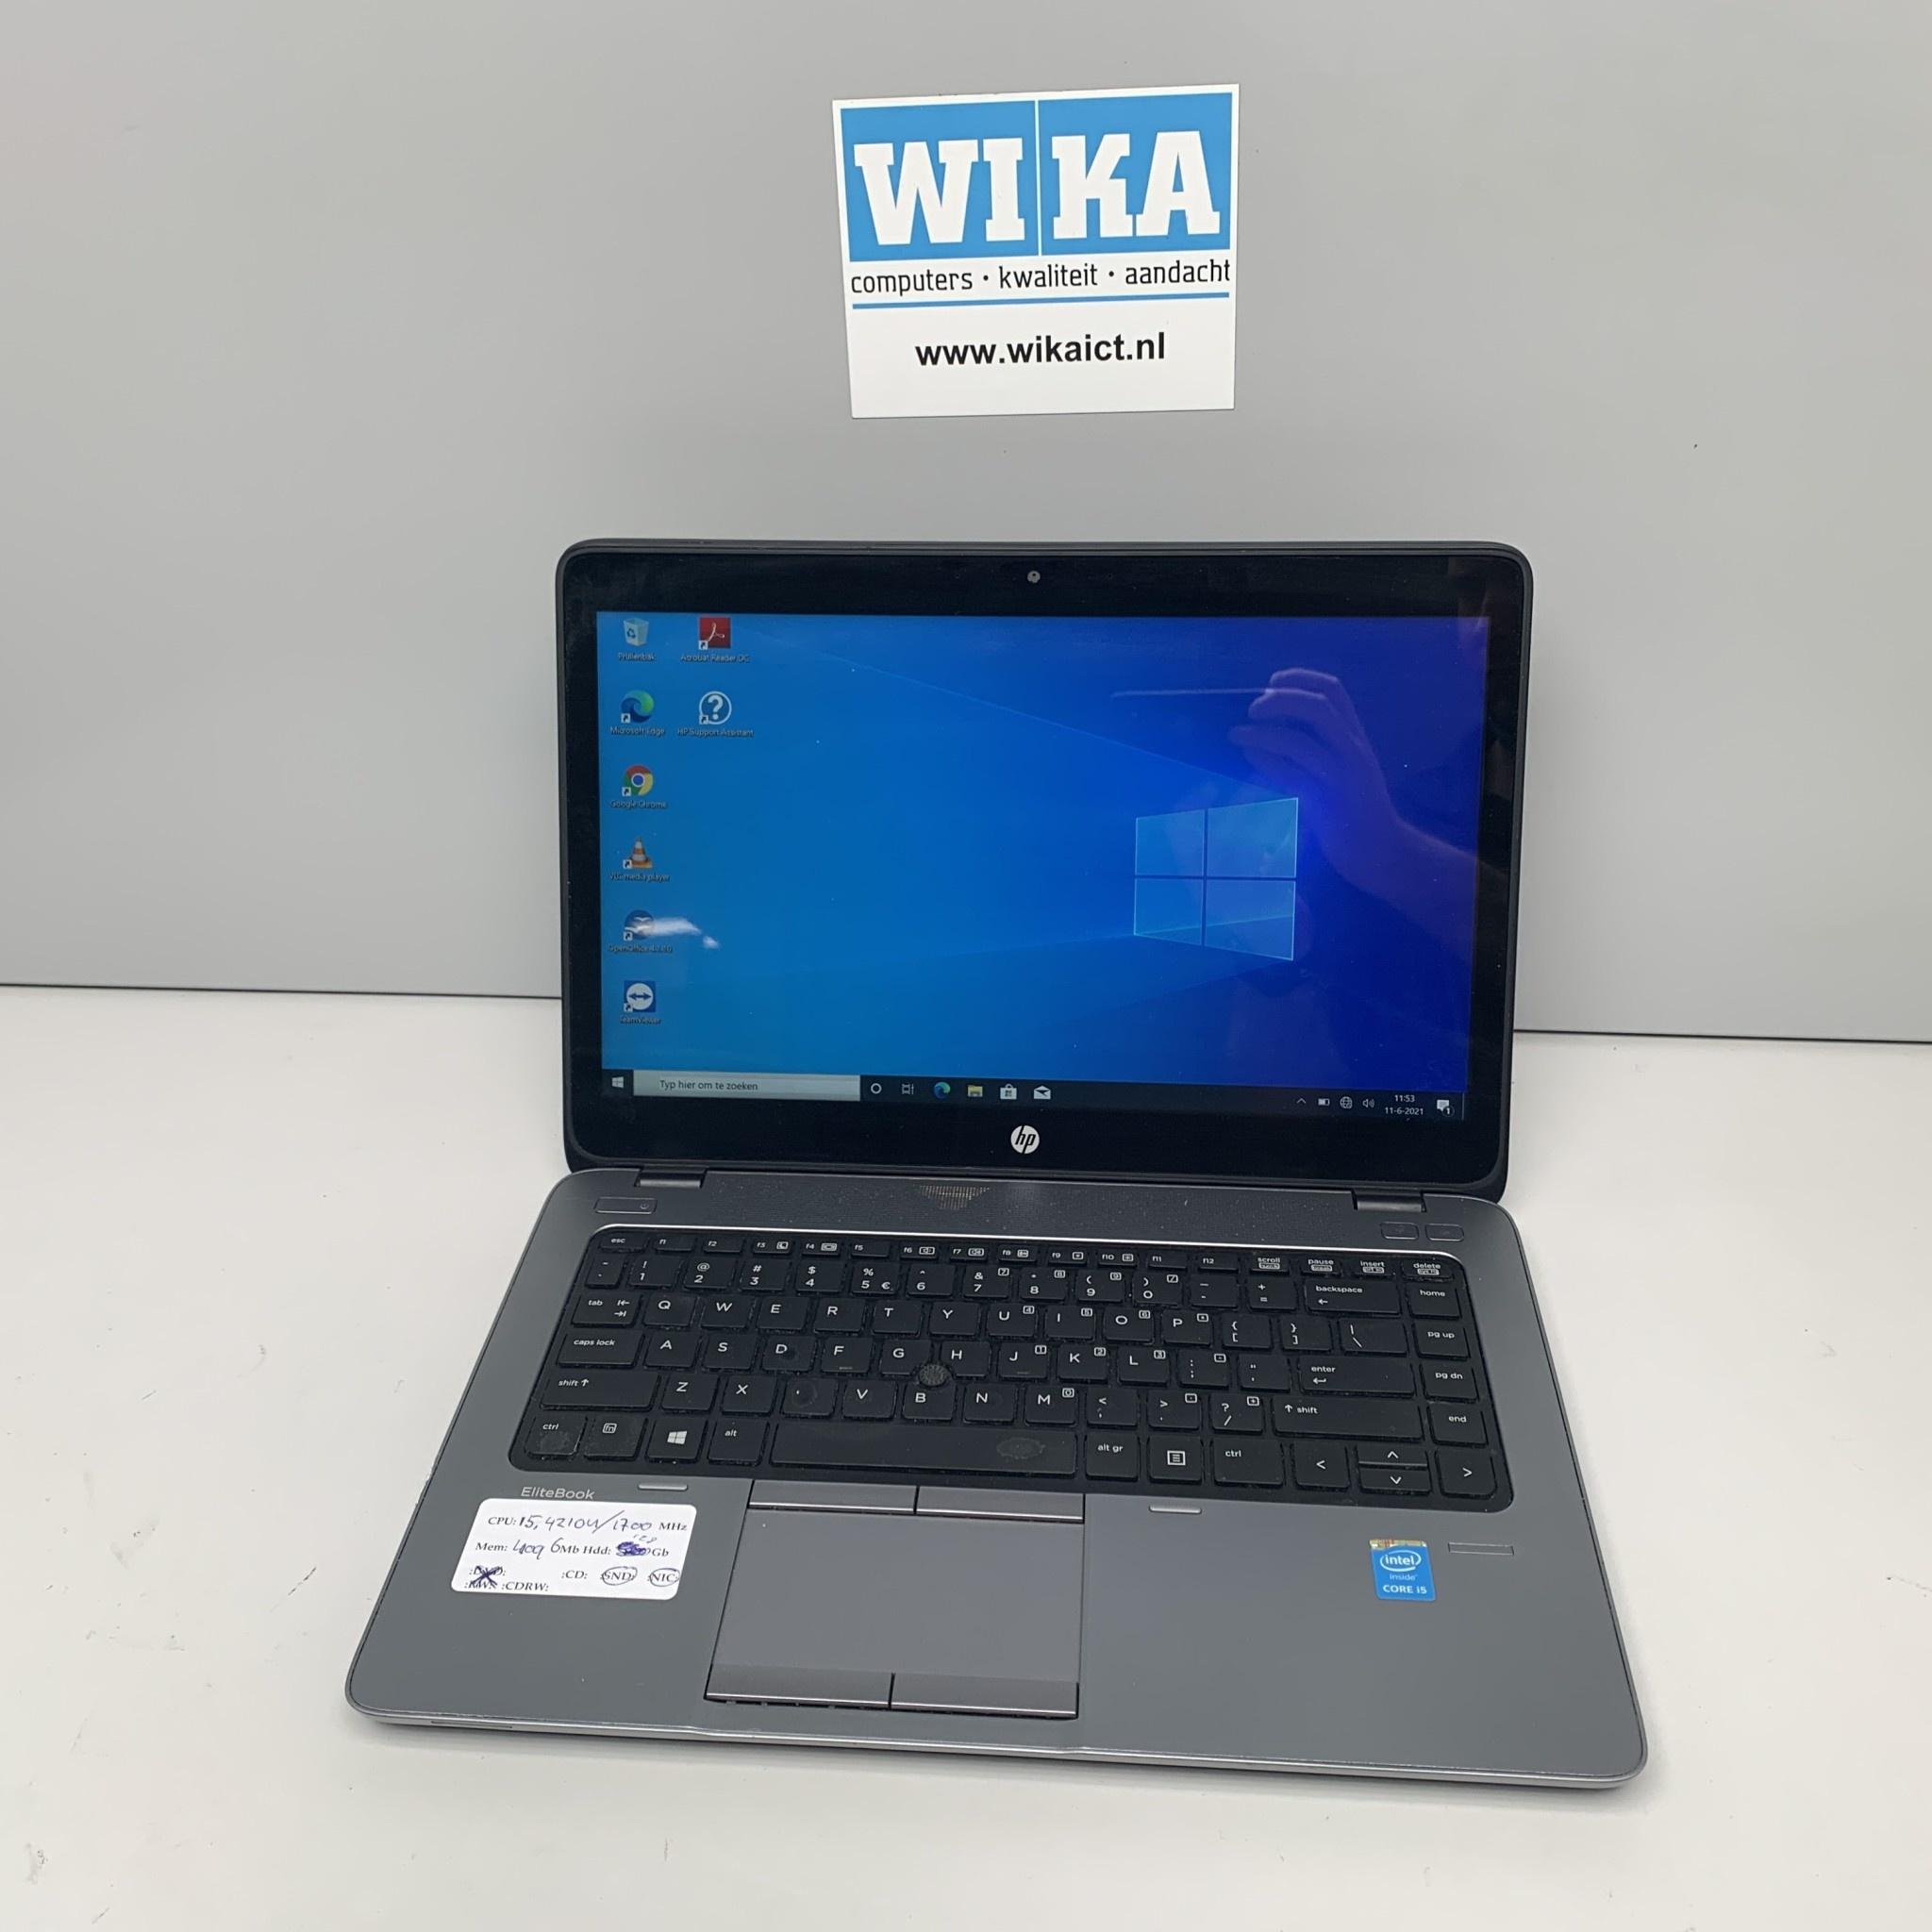 HP Elitebook 840 G1 i5 4Gb SSD 14.1 inch touch W10P laptop